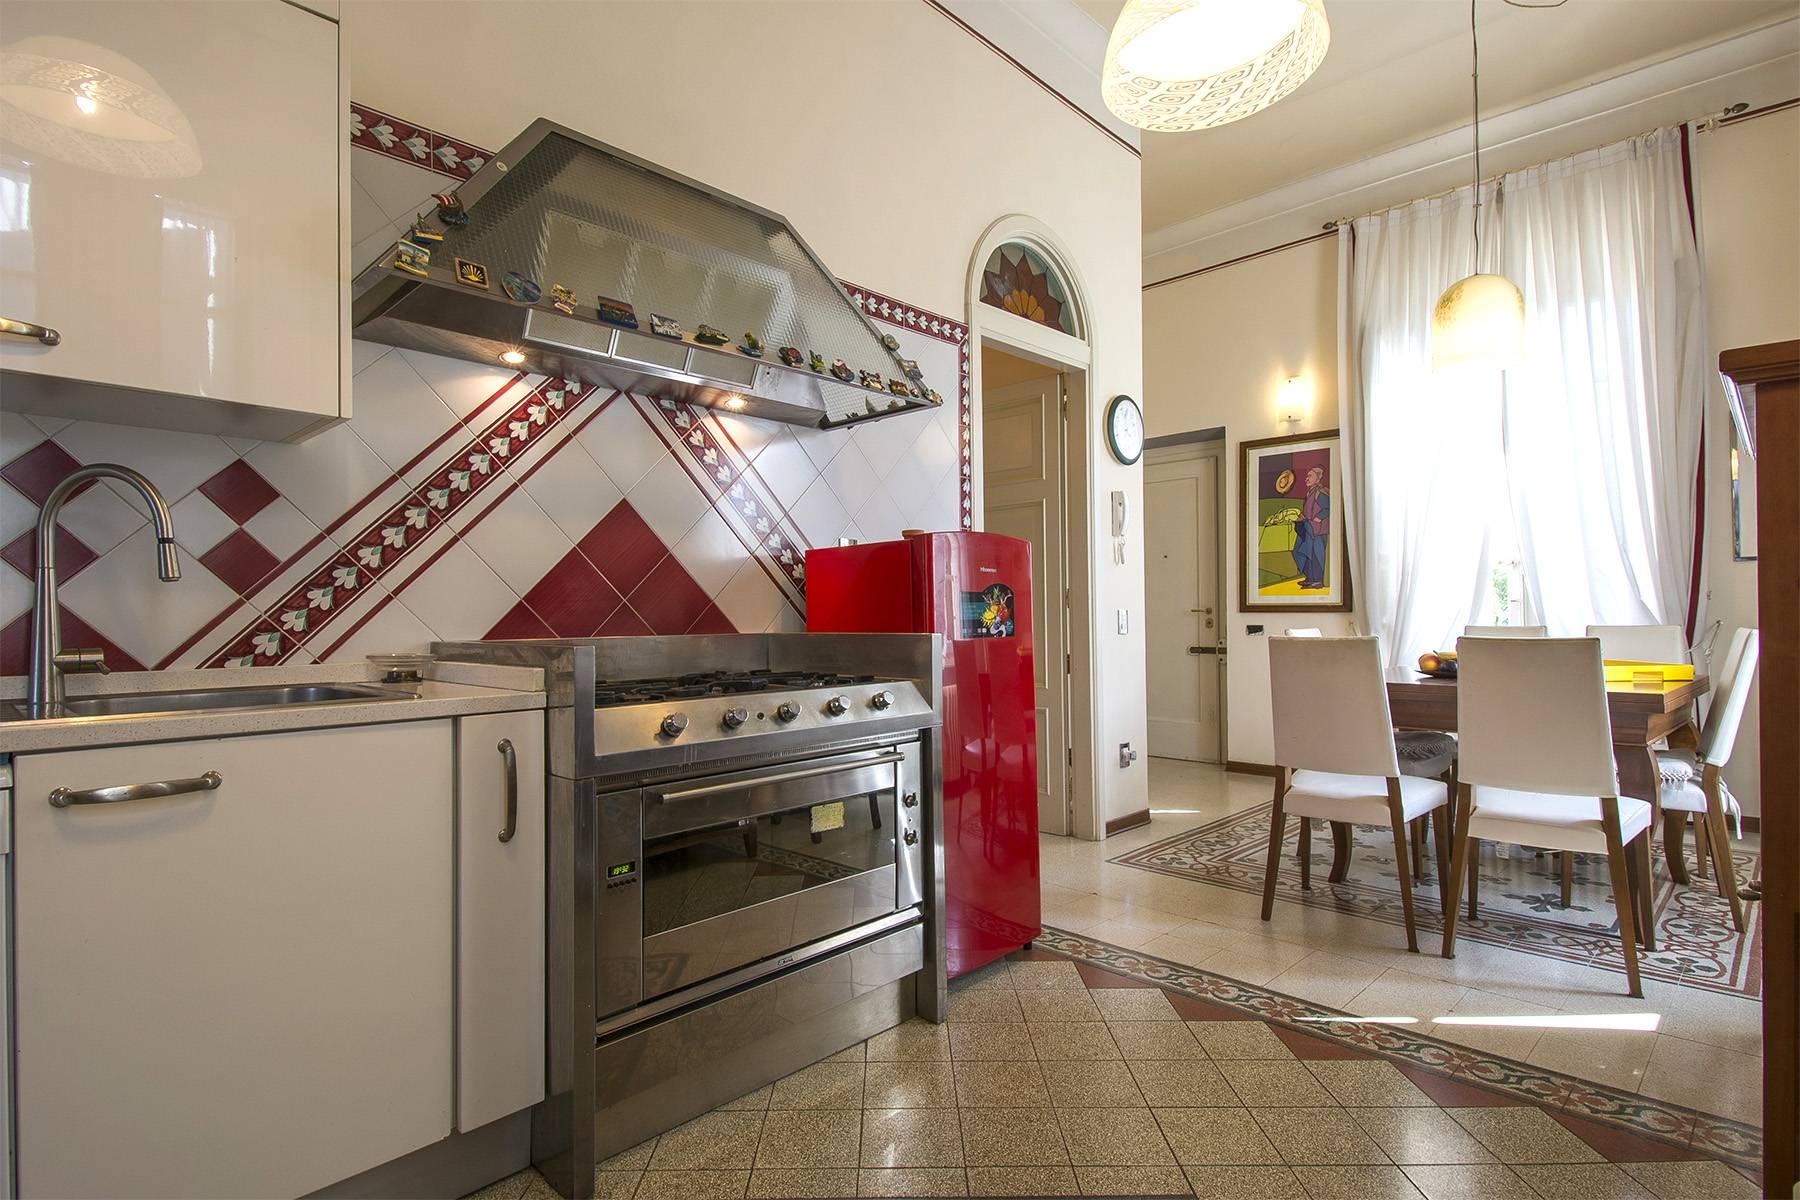 Villa in Vendita a Lucca: 5 locali, 350 mq - Foto 6